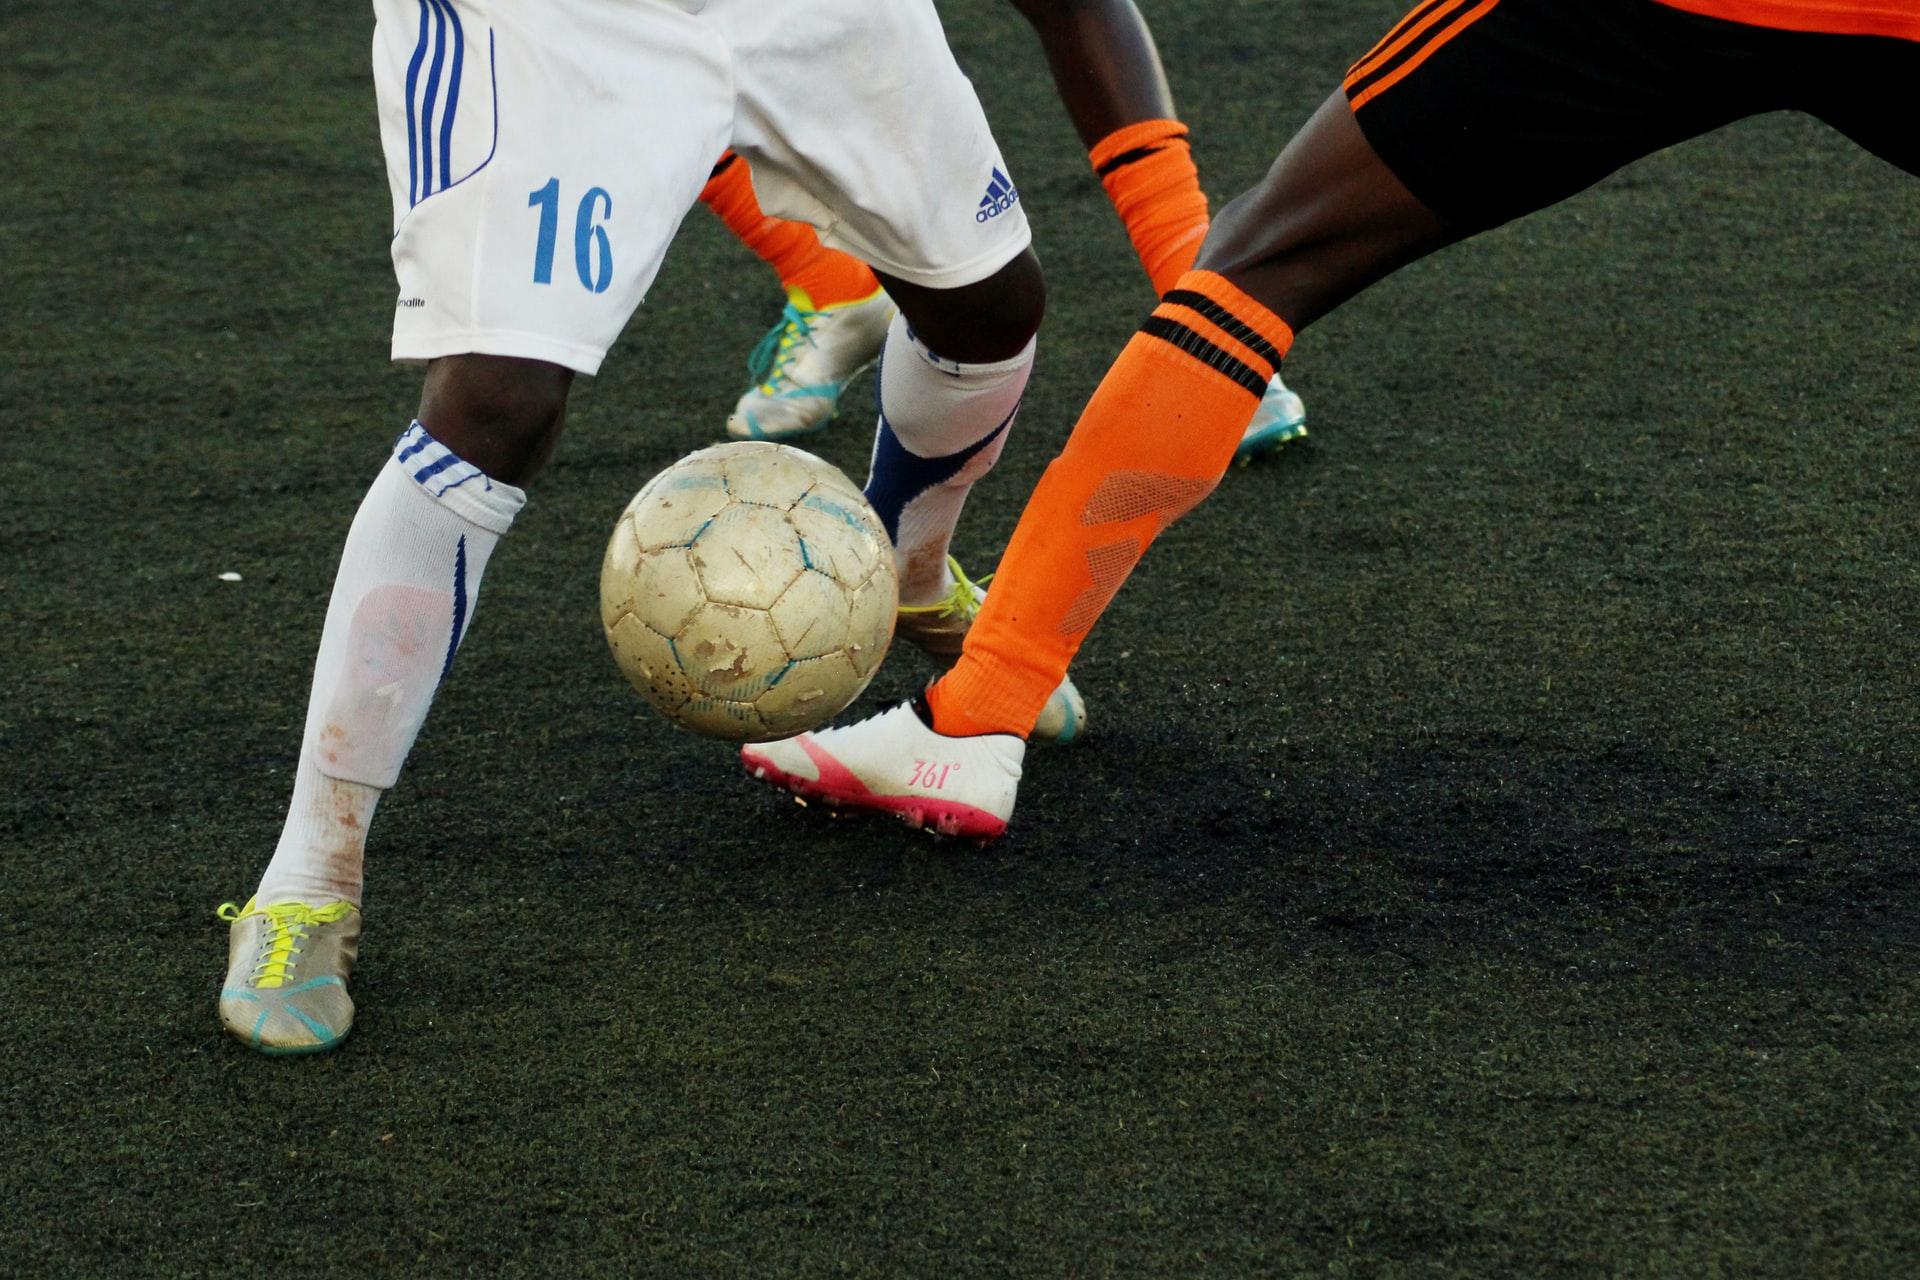 Image de foot